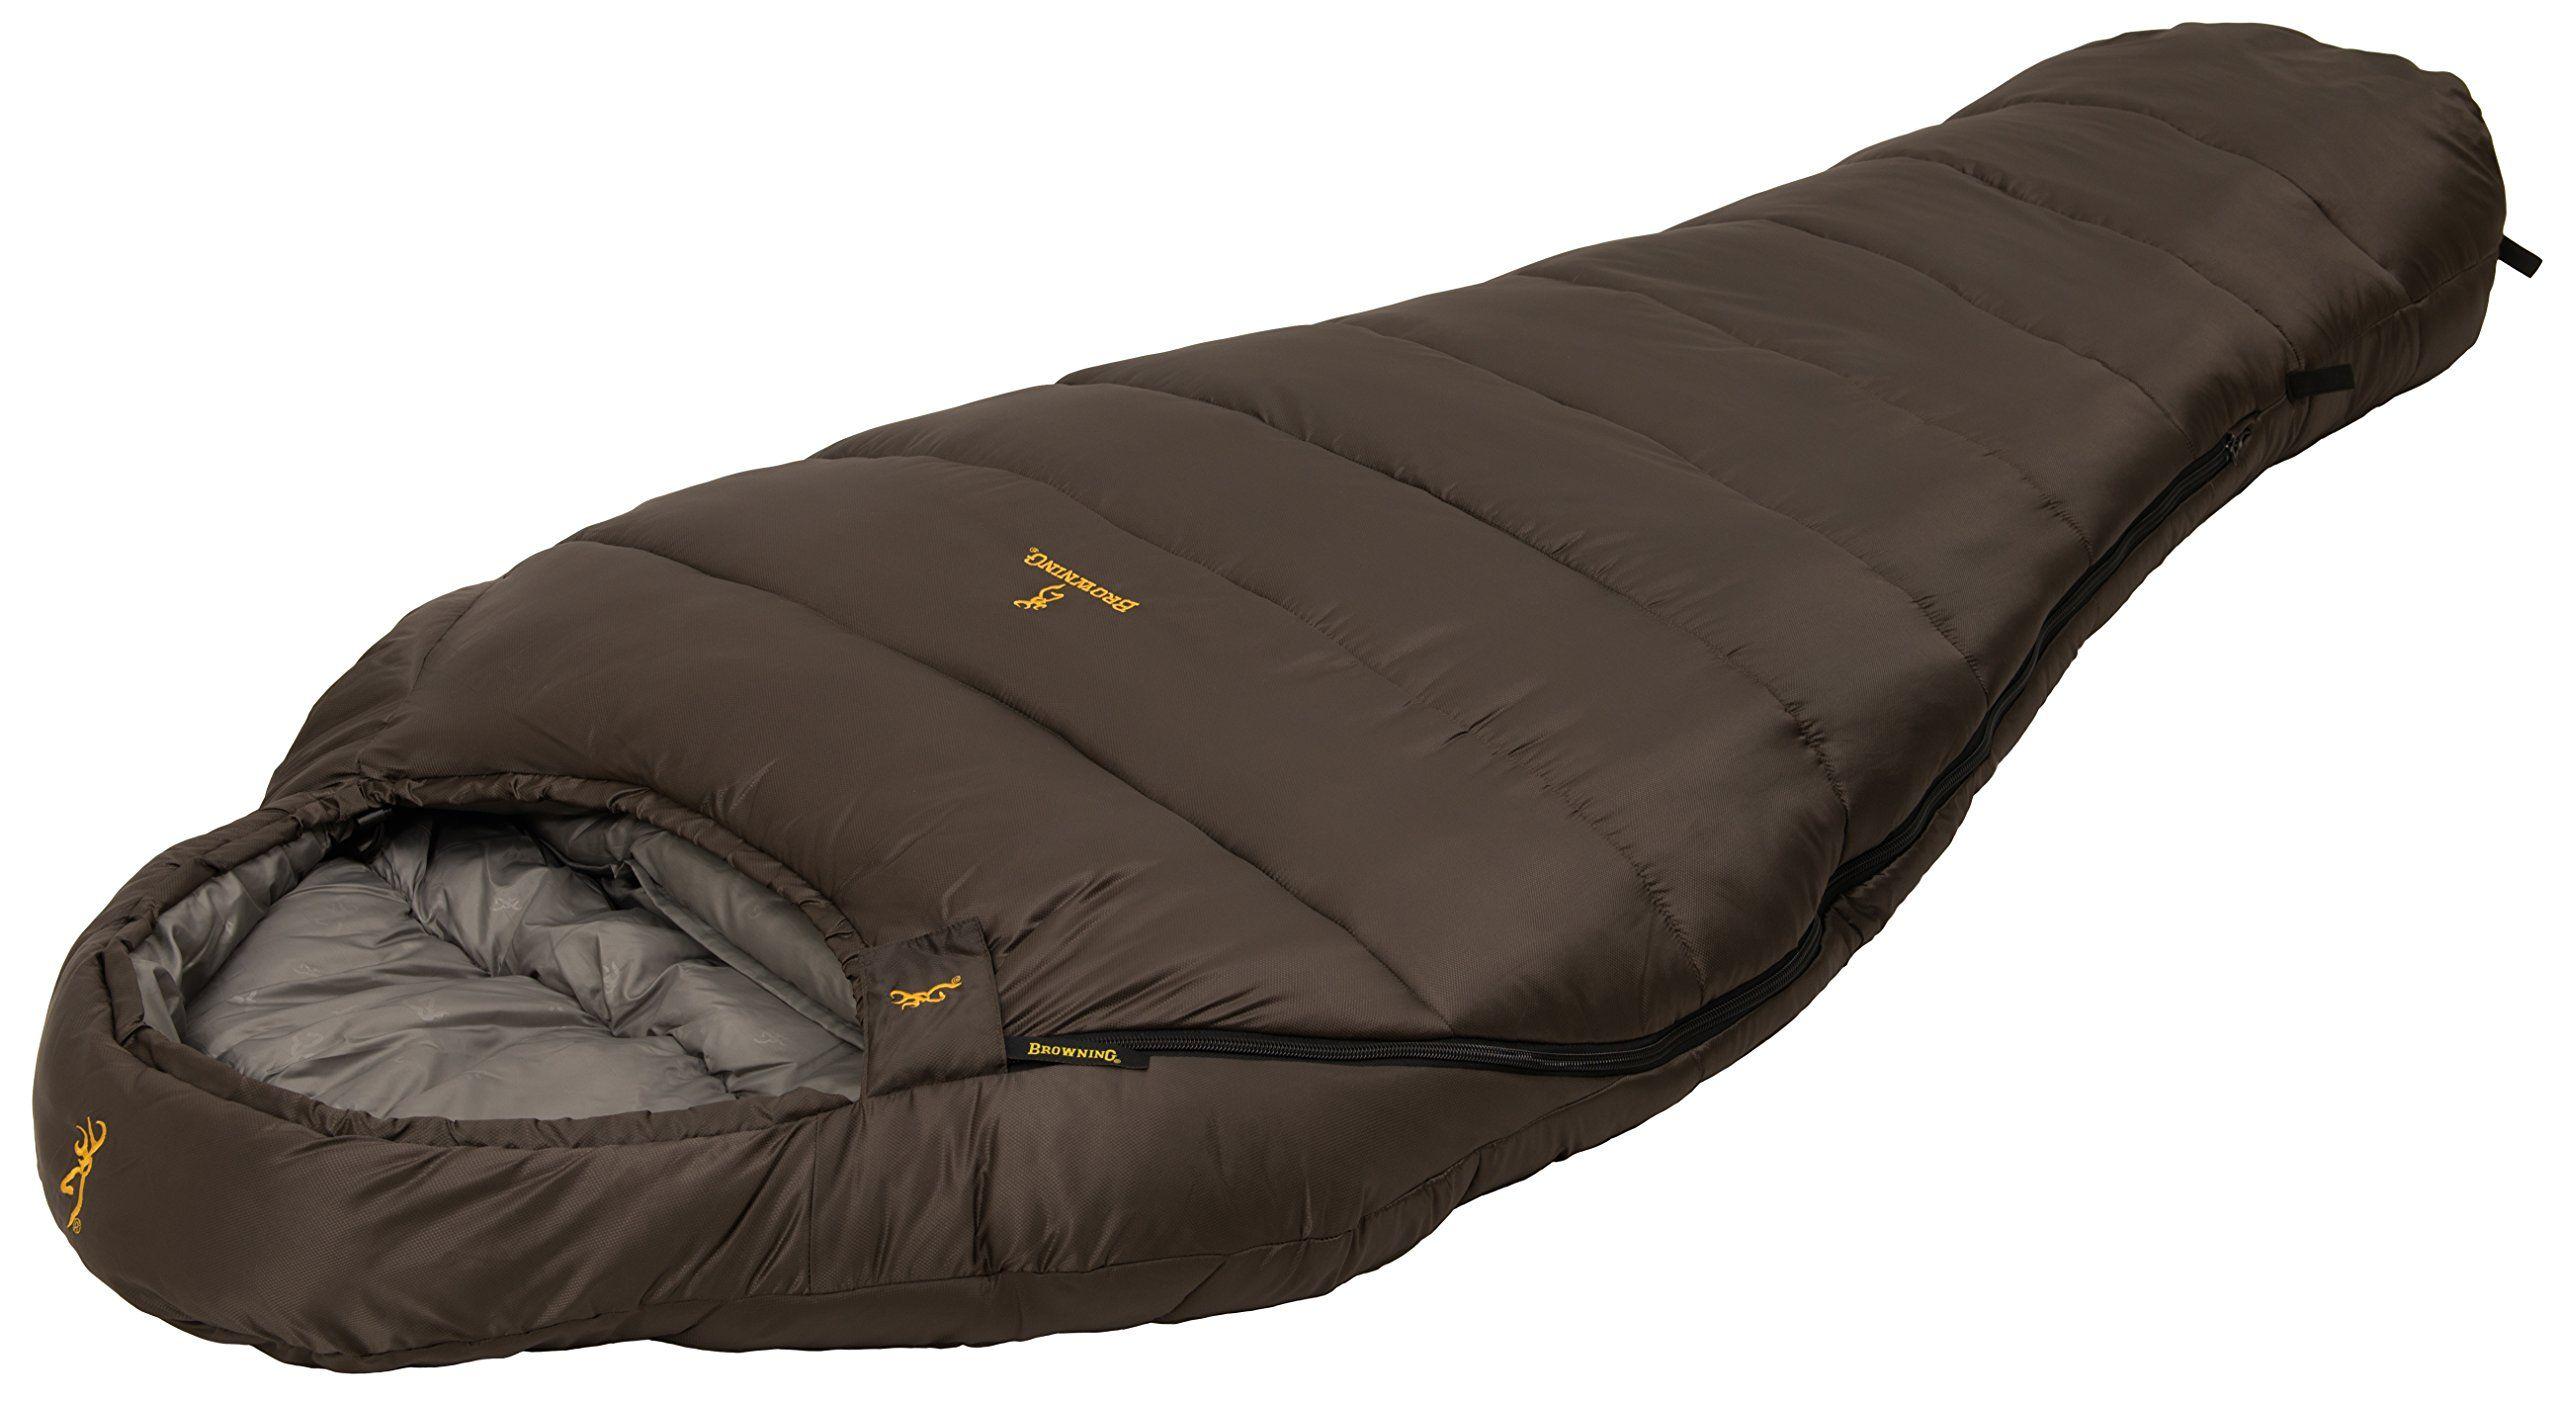 Browning Camping Denali 0 Degree Wide Sleeping Bag Frigid Weather Mummy Sleeping Bag With Techloft Insula Camping Bed Mummy Sleeping Bag Sleeping Bags Camping